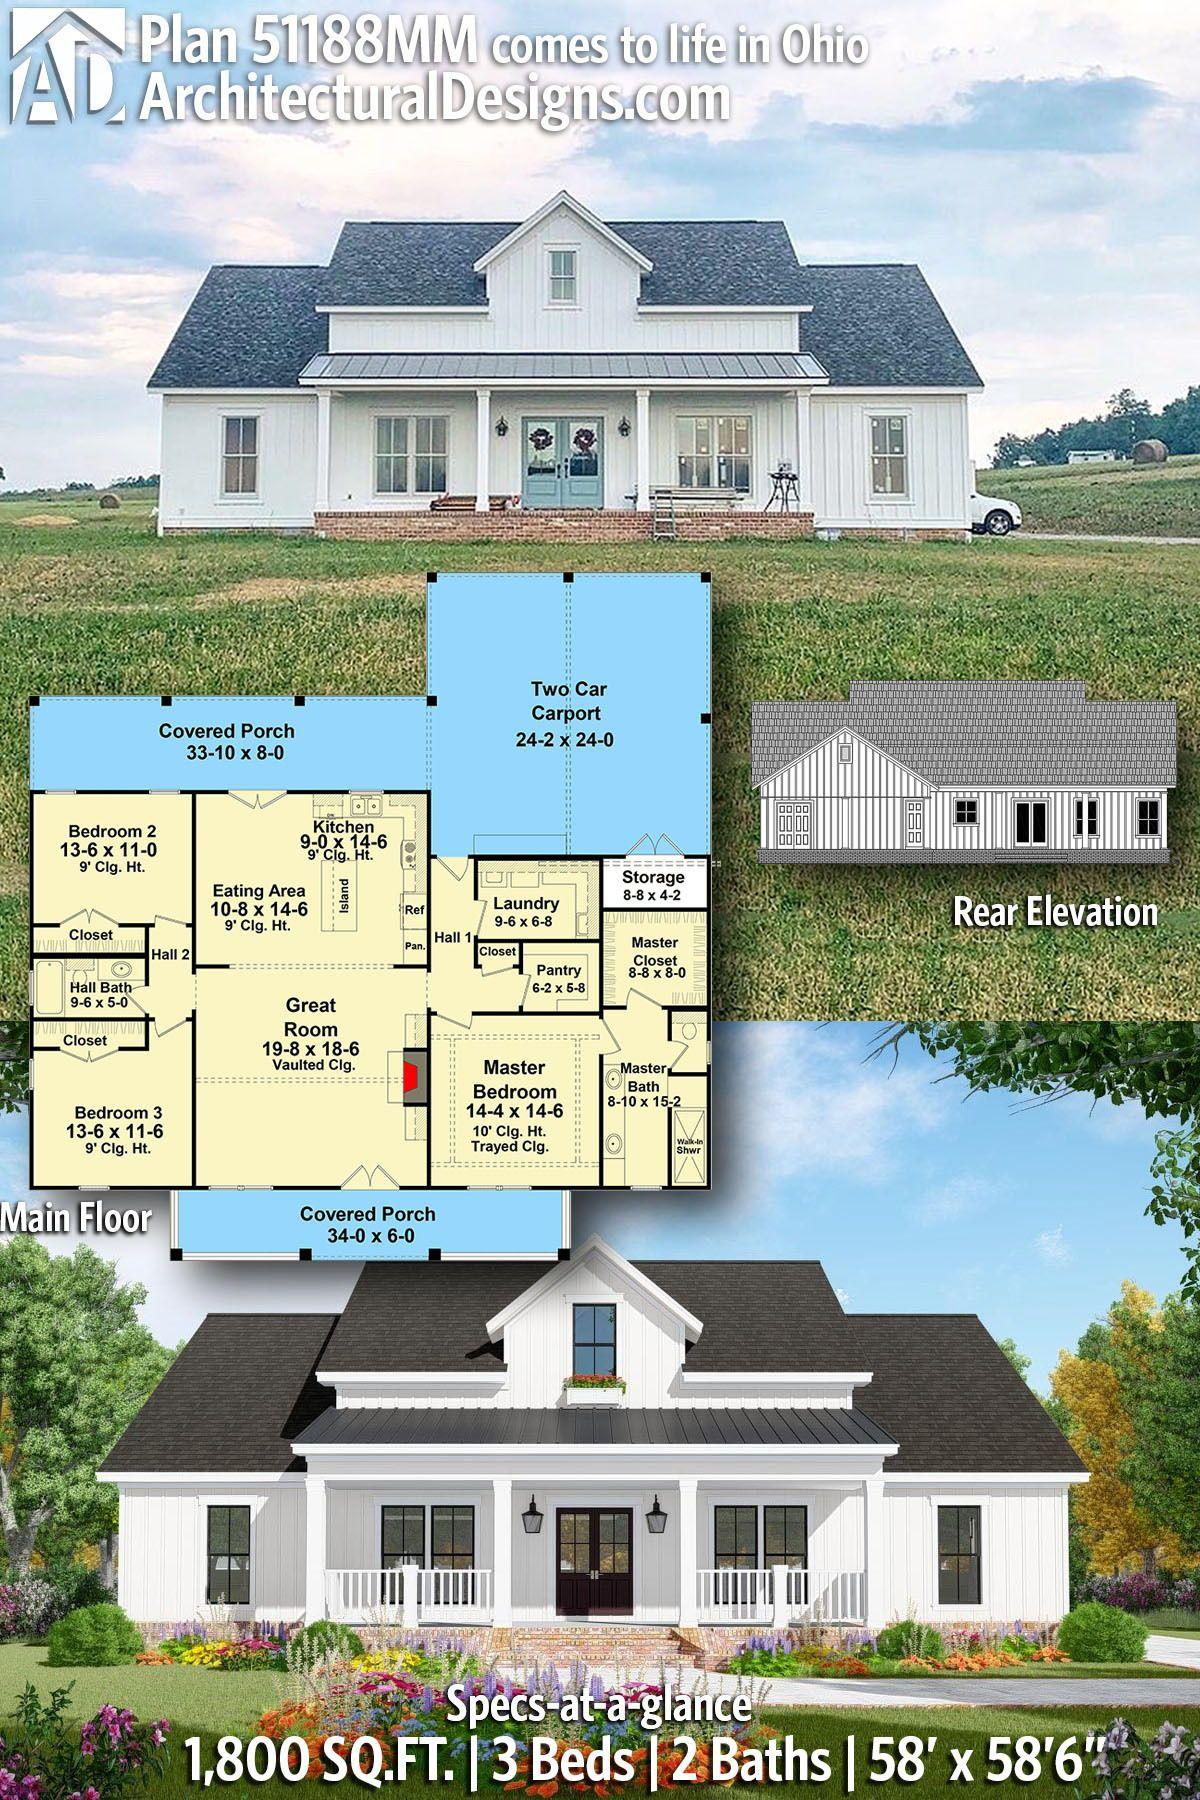 Plan 51188mm Open Concept 3 Bed Modern Farmhouse Plan With Carport In 2020 Modern Farmhouse Plans Farmhouse Plans Dream House Plans